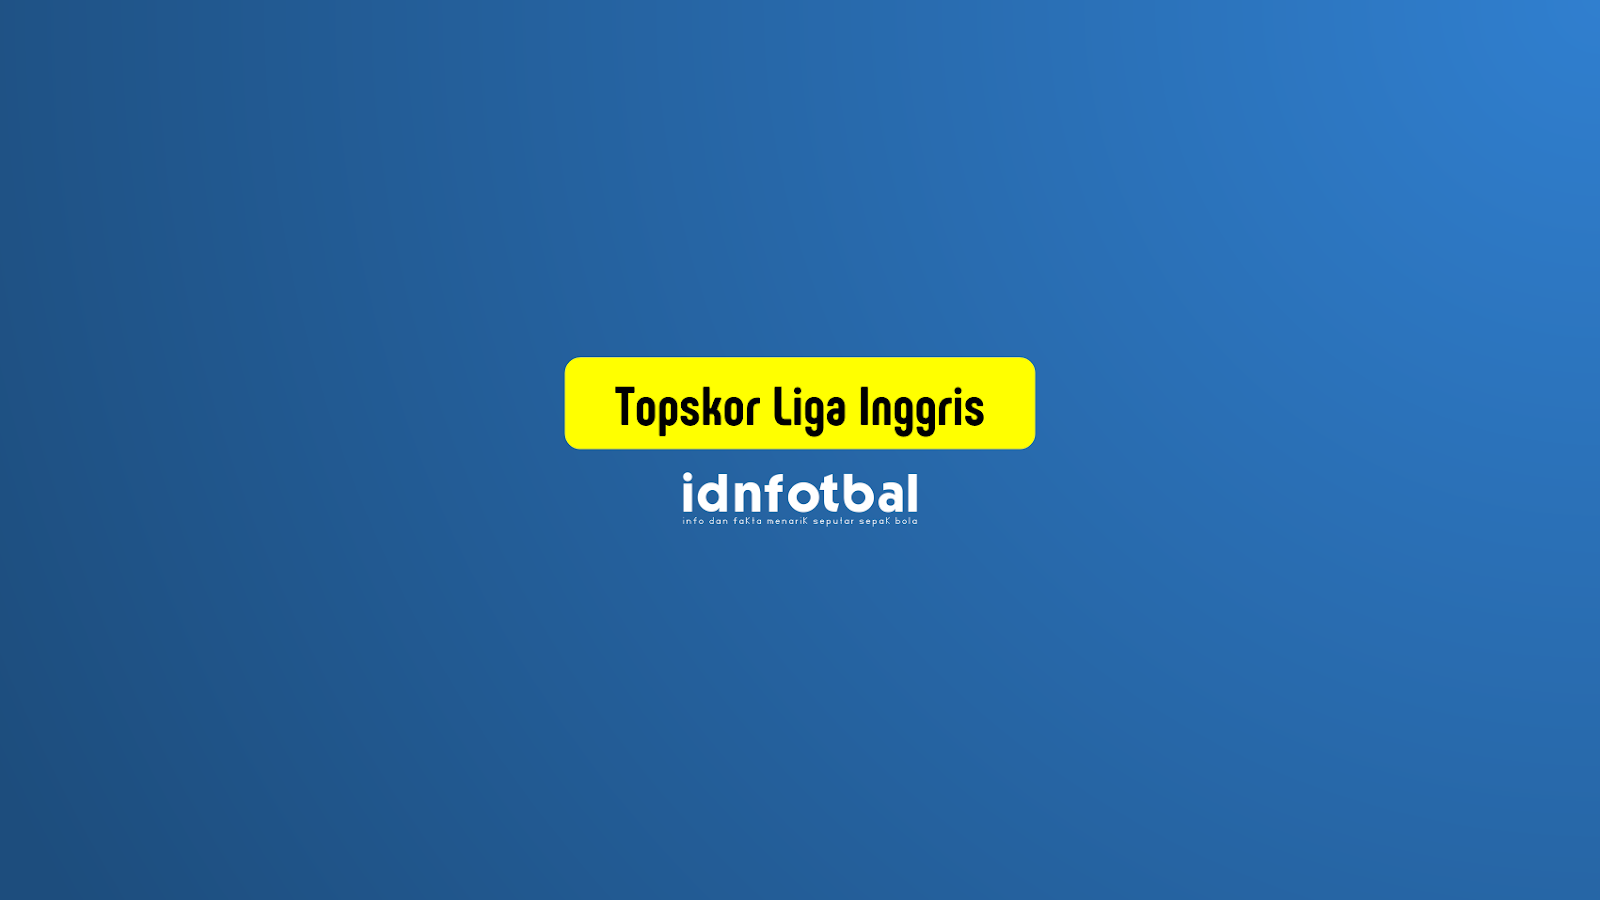 idnfotbal - Daftar Topskor Liga Inggris